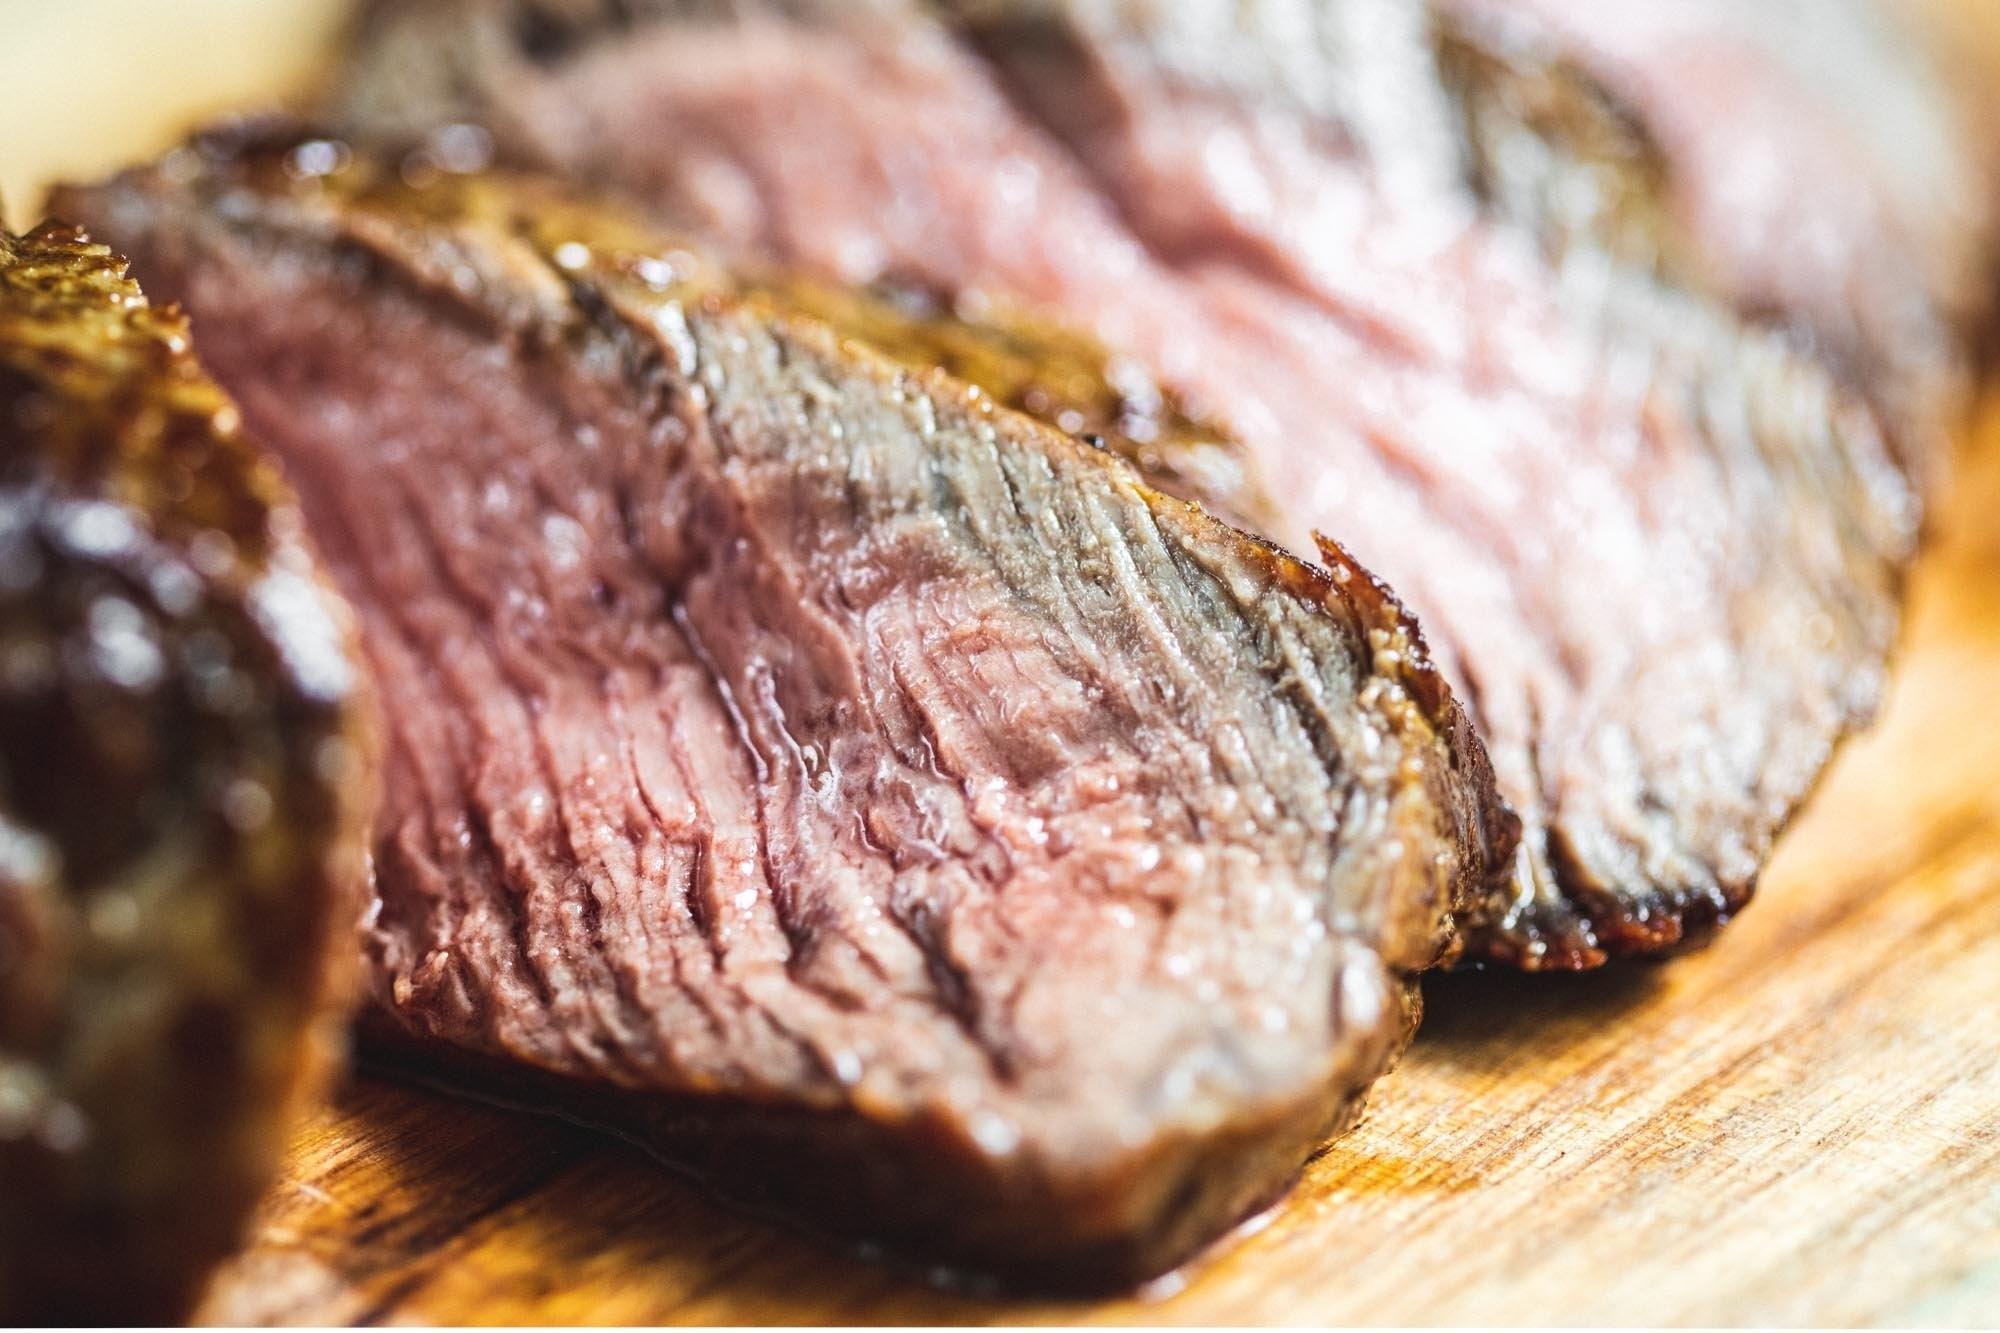 Beef sharing sirloin steak